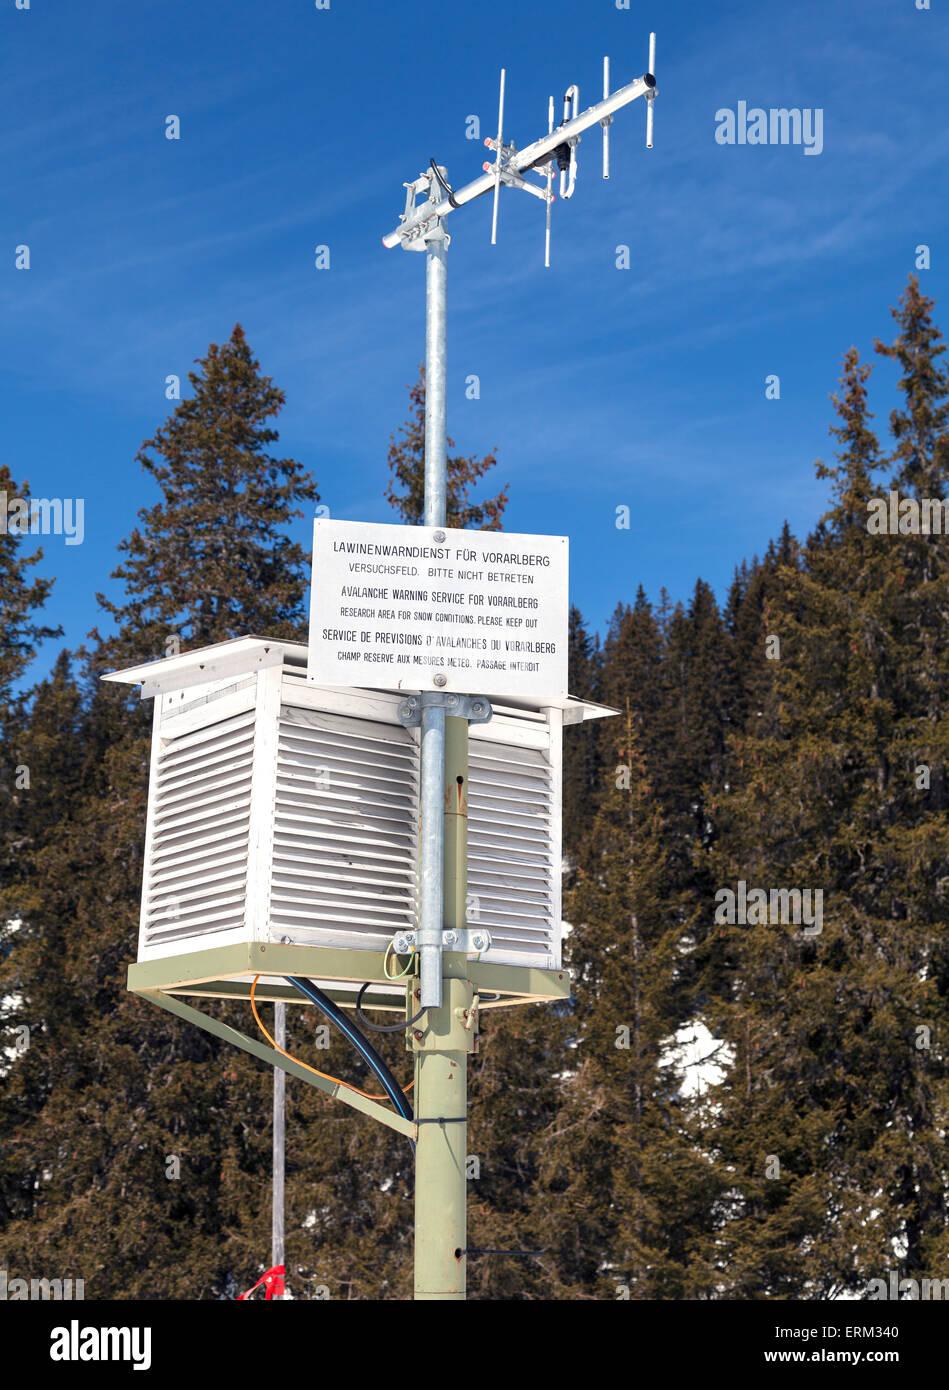 Advance avalanche warning station - Stock Image